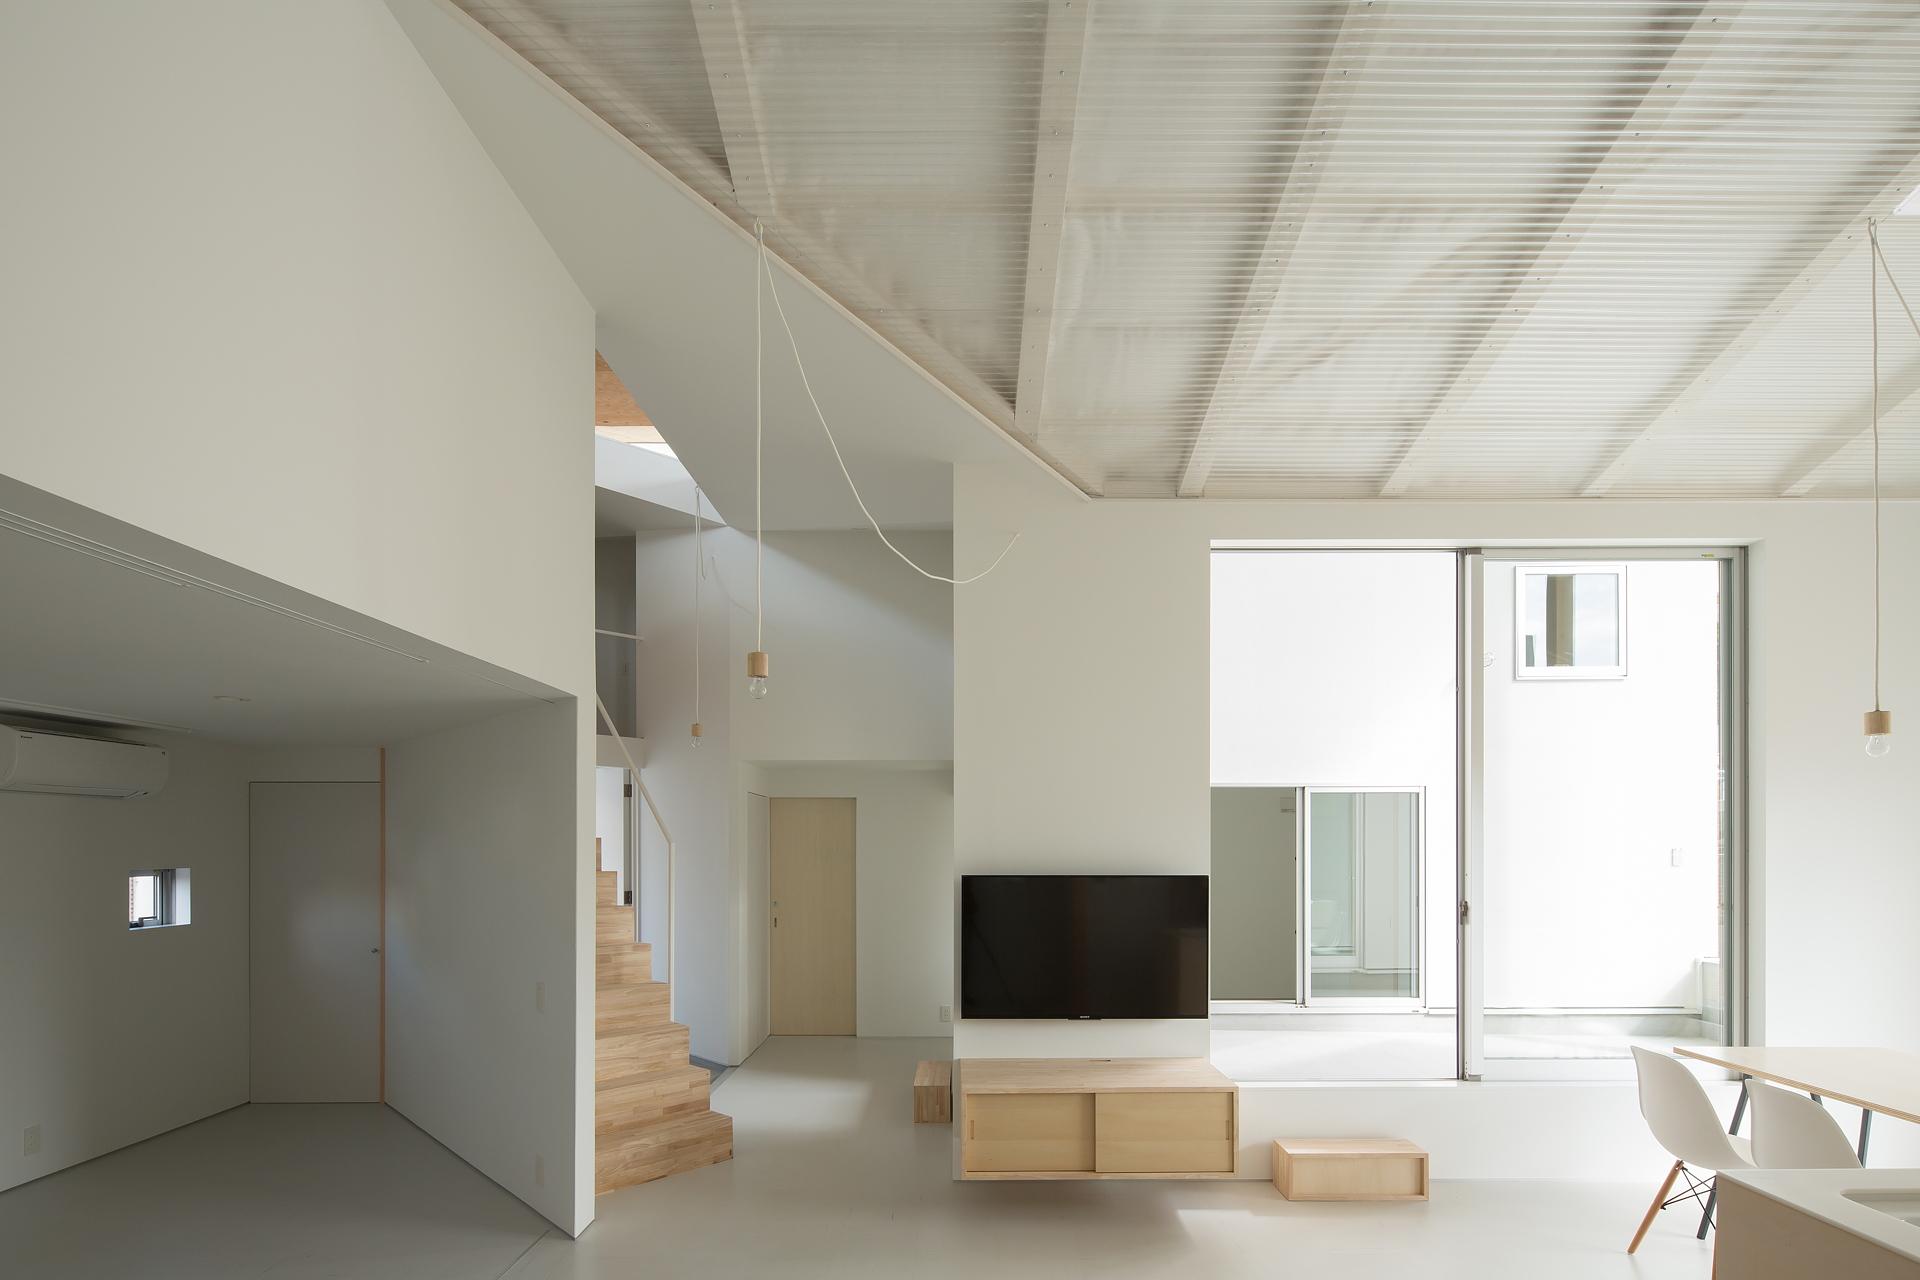 y+M design office e la Floating Roof House a Kobe